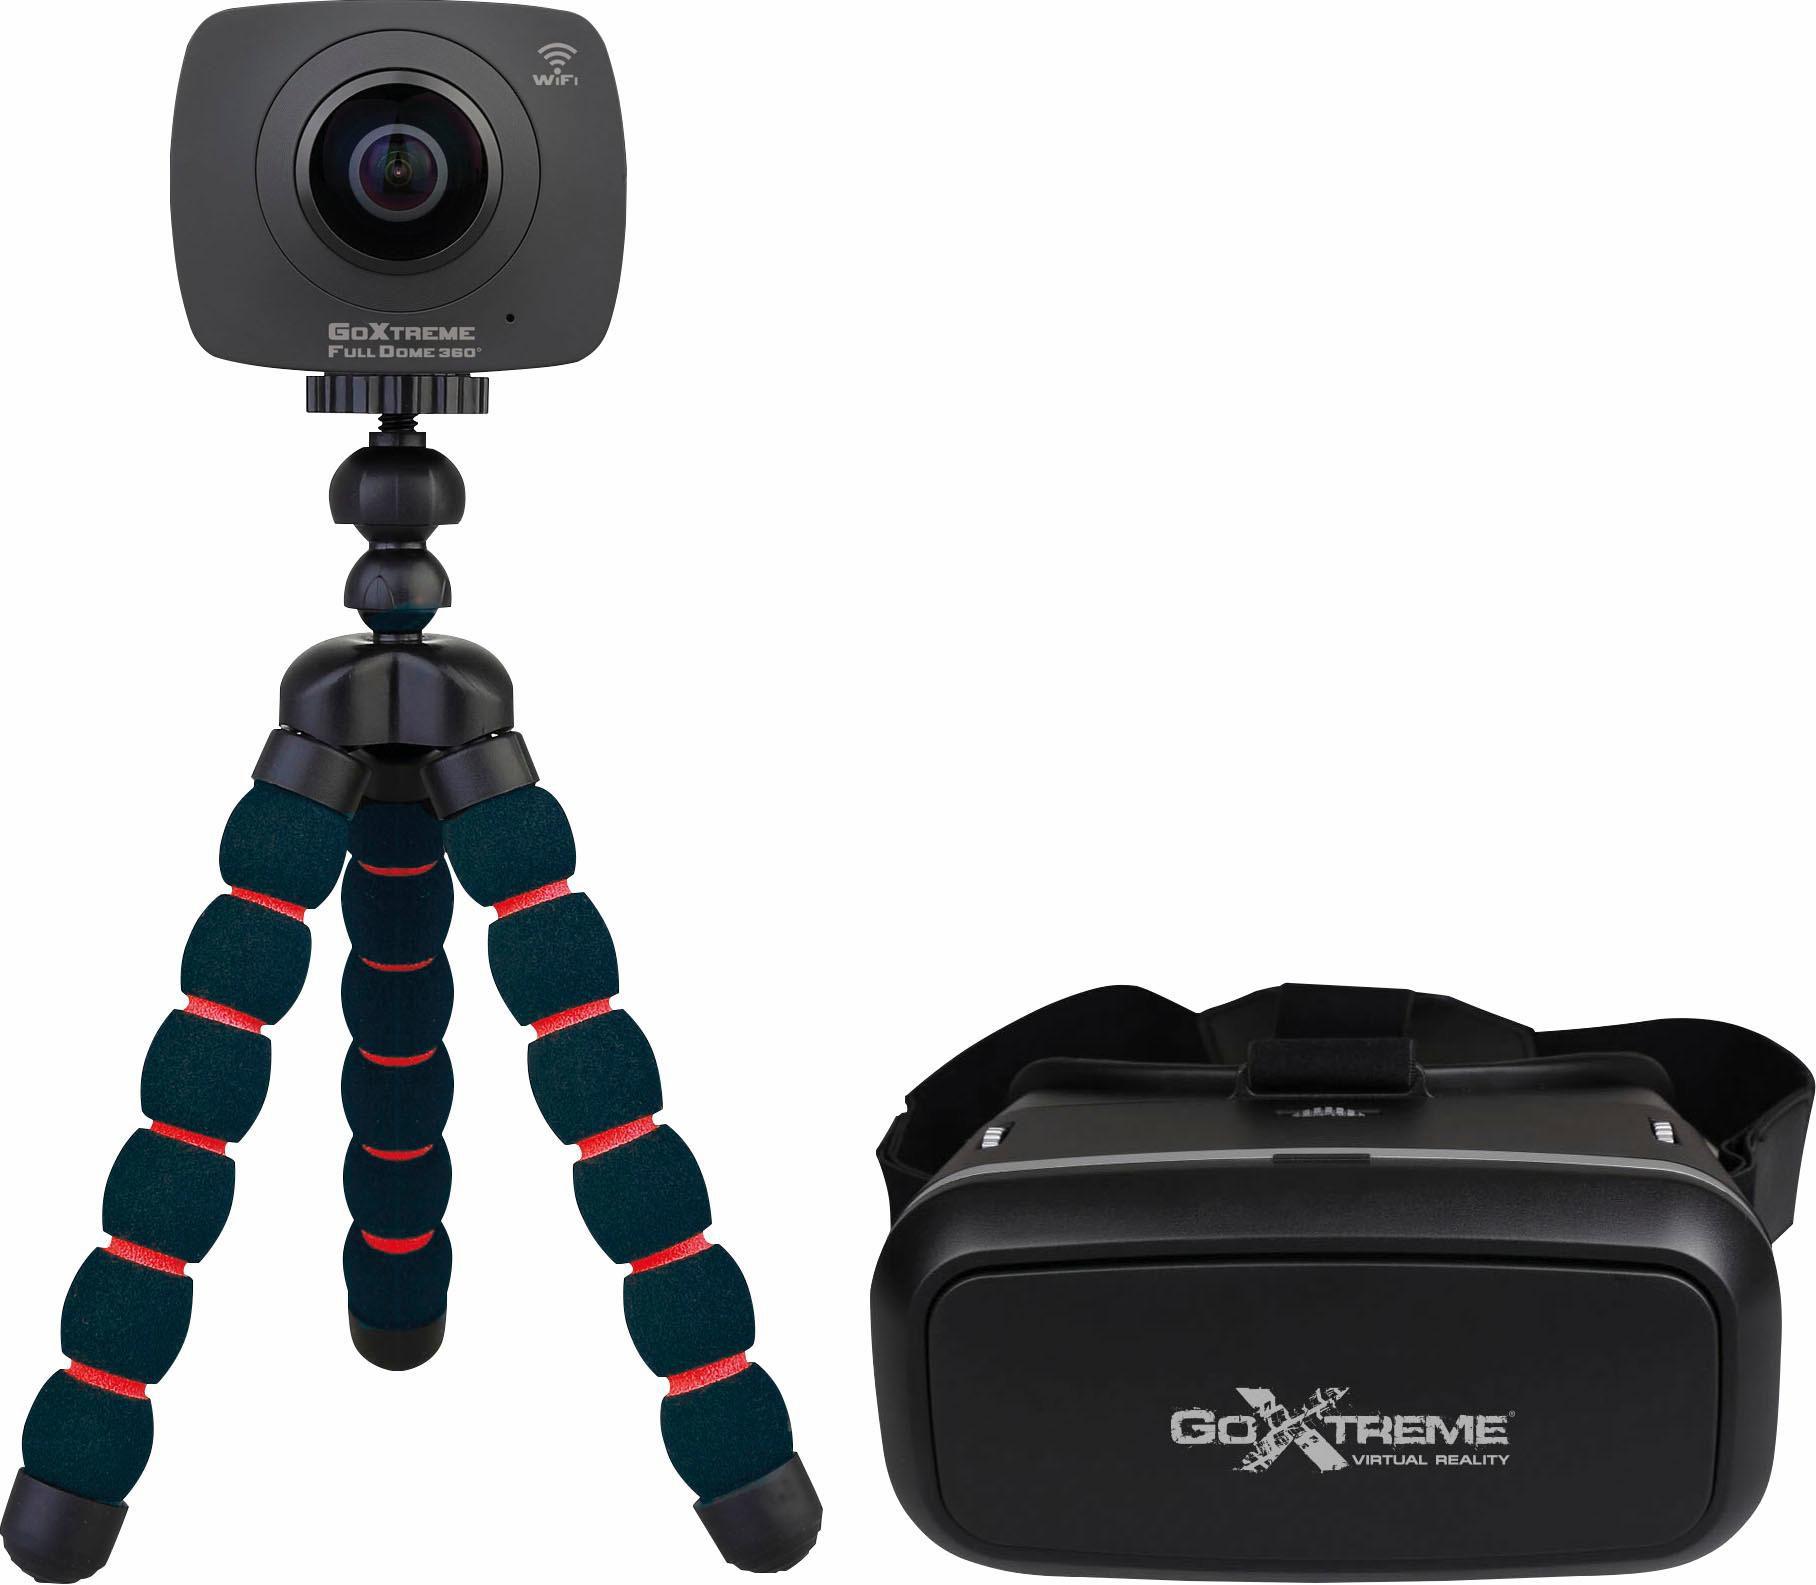 EASYPIX Easypix Full Dome 360° VR Headset Bundle Panorama Kamera, 4 Megapixel, 2,4 cm (1 Zoll) Display